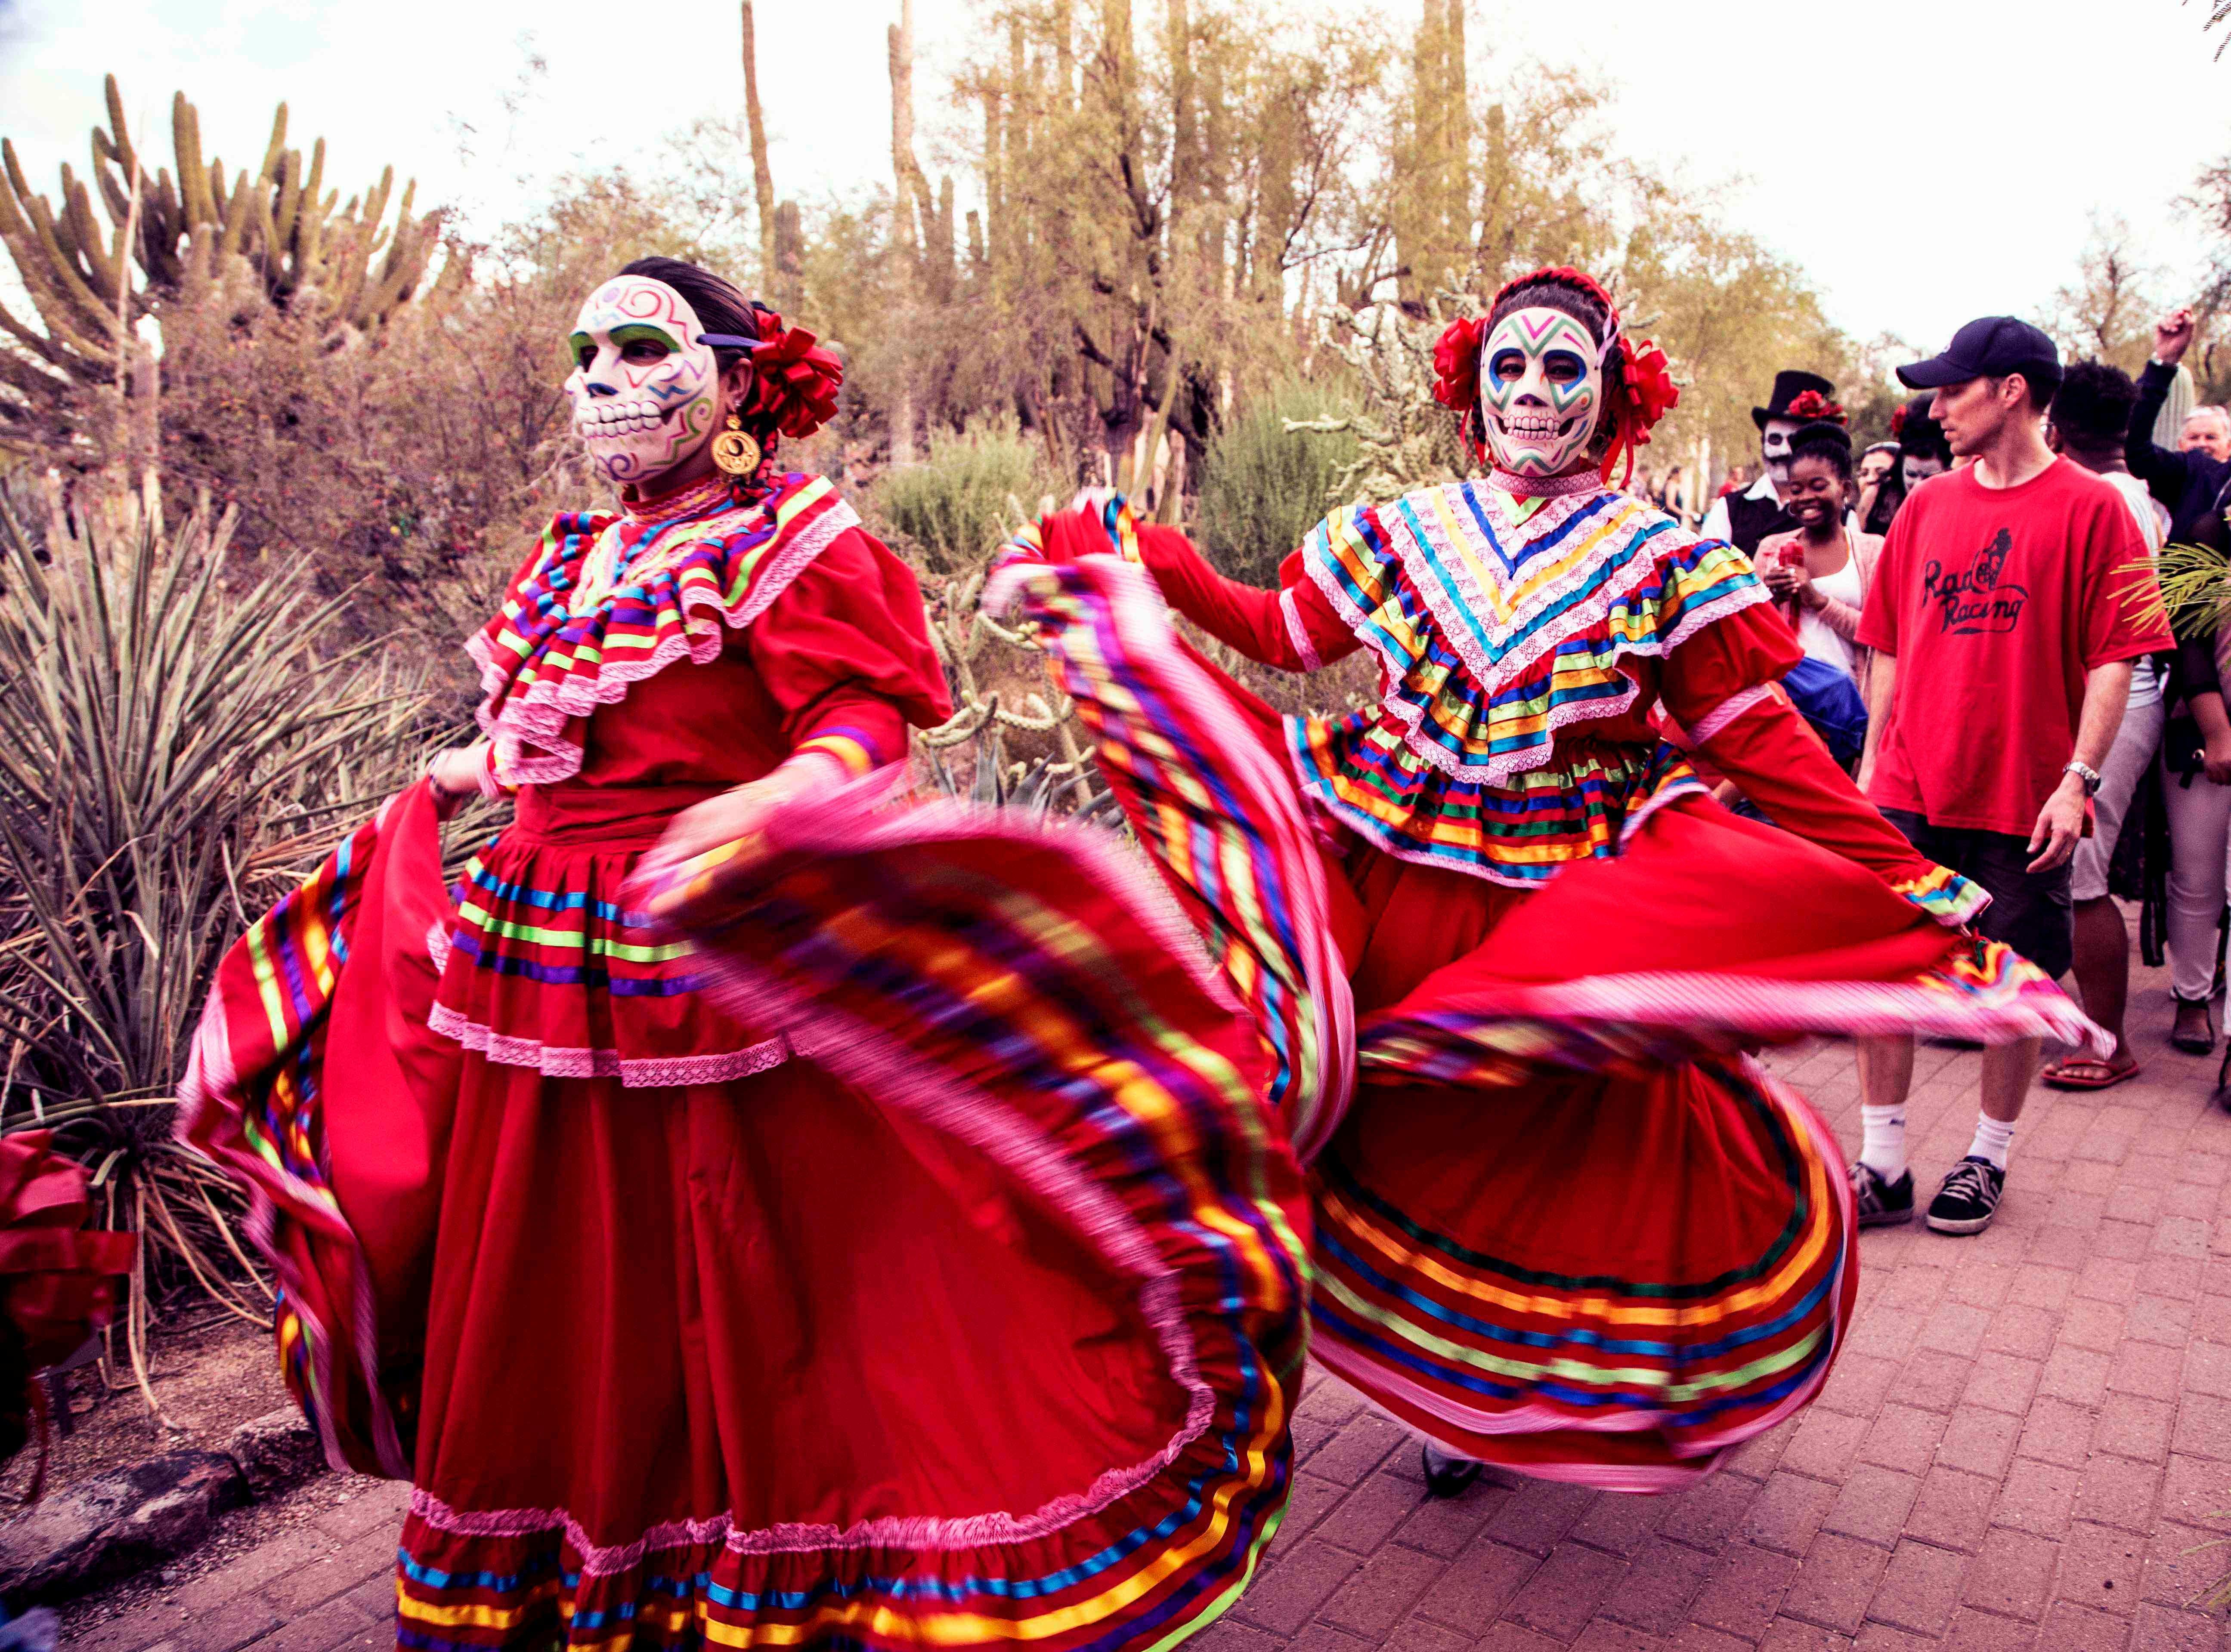 Dia de los Muertos festivities at the Desert Botanical Garden.